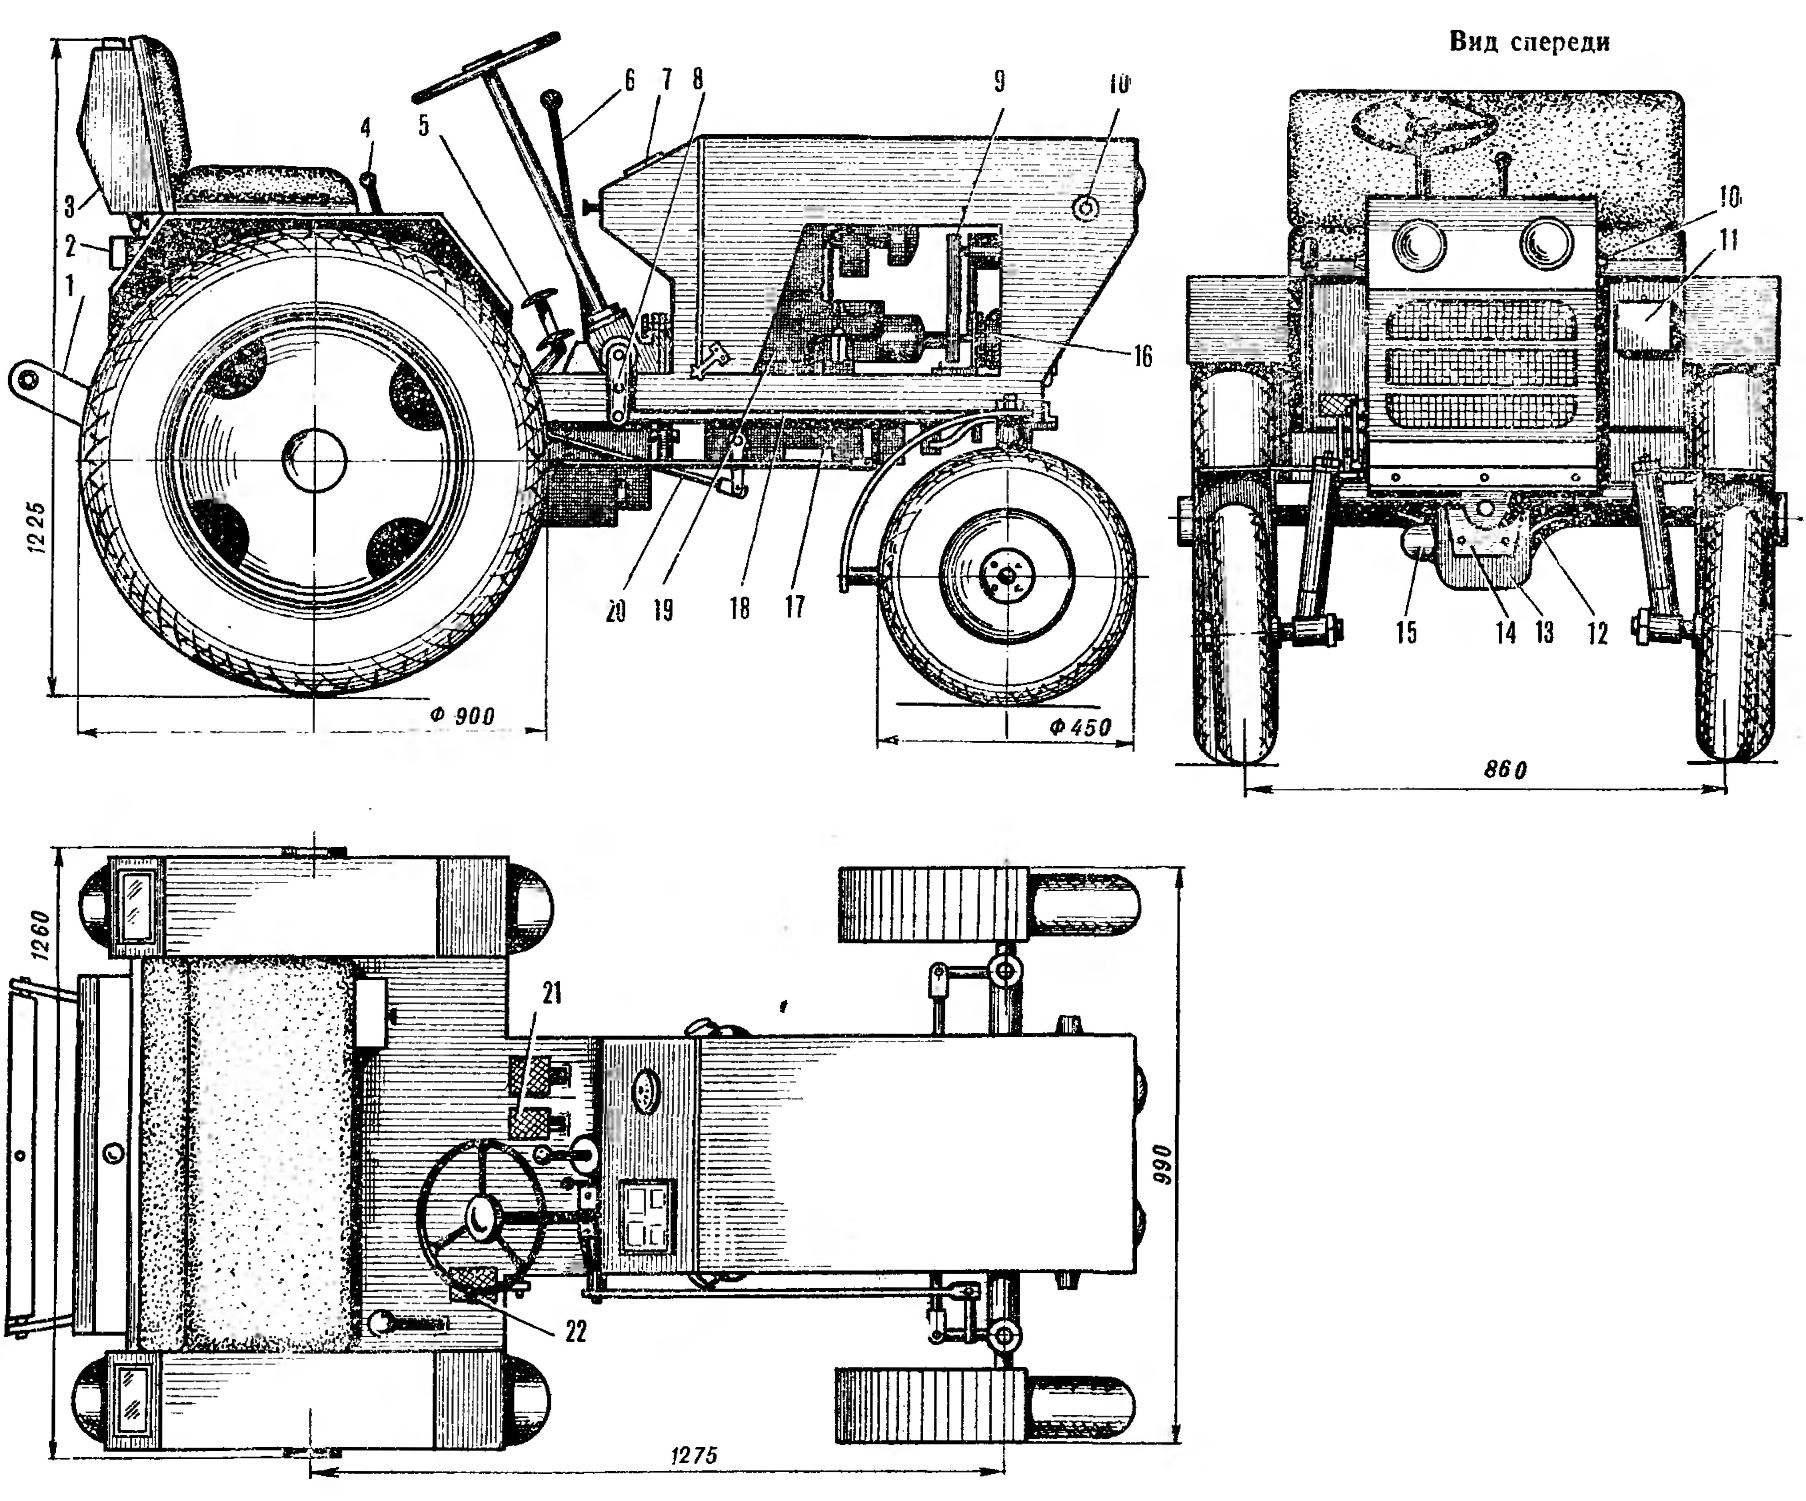 Рис. 1. Микротрактор «Амурчонок»